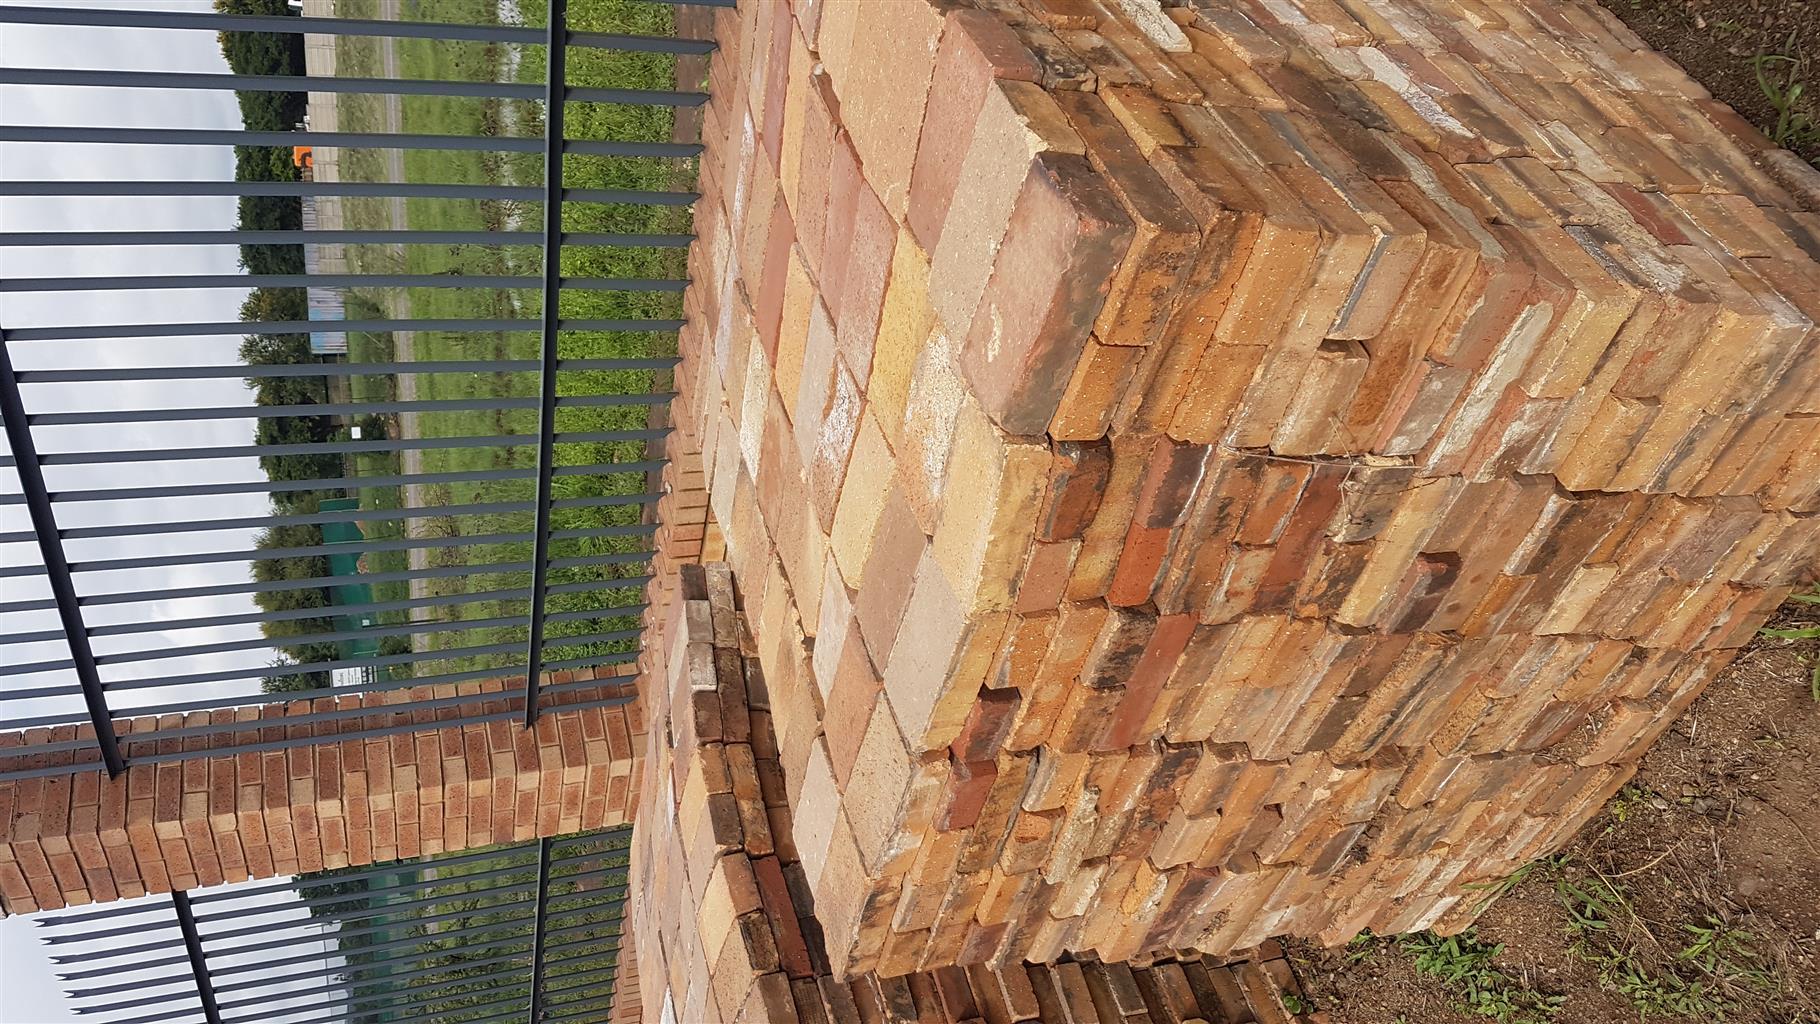 Paving clay 2nd hand bricks for ssle